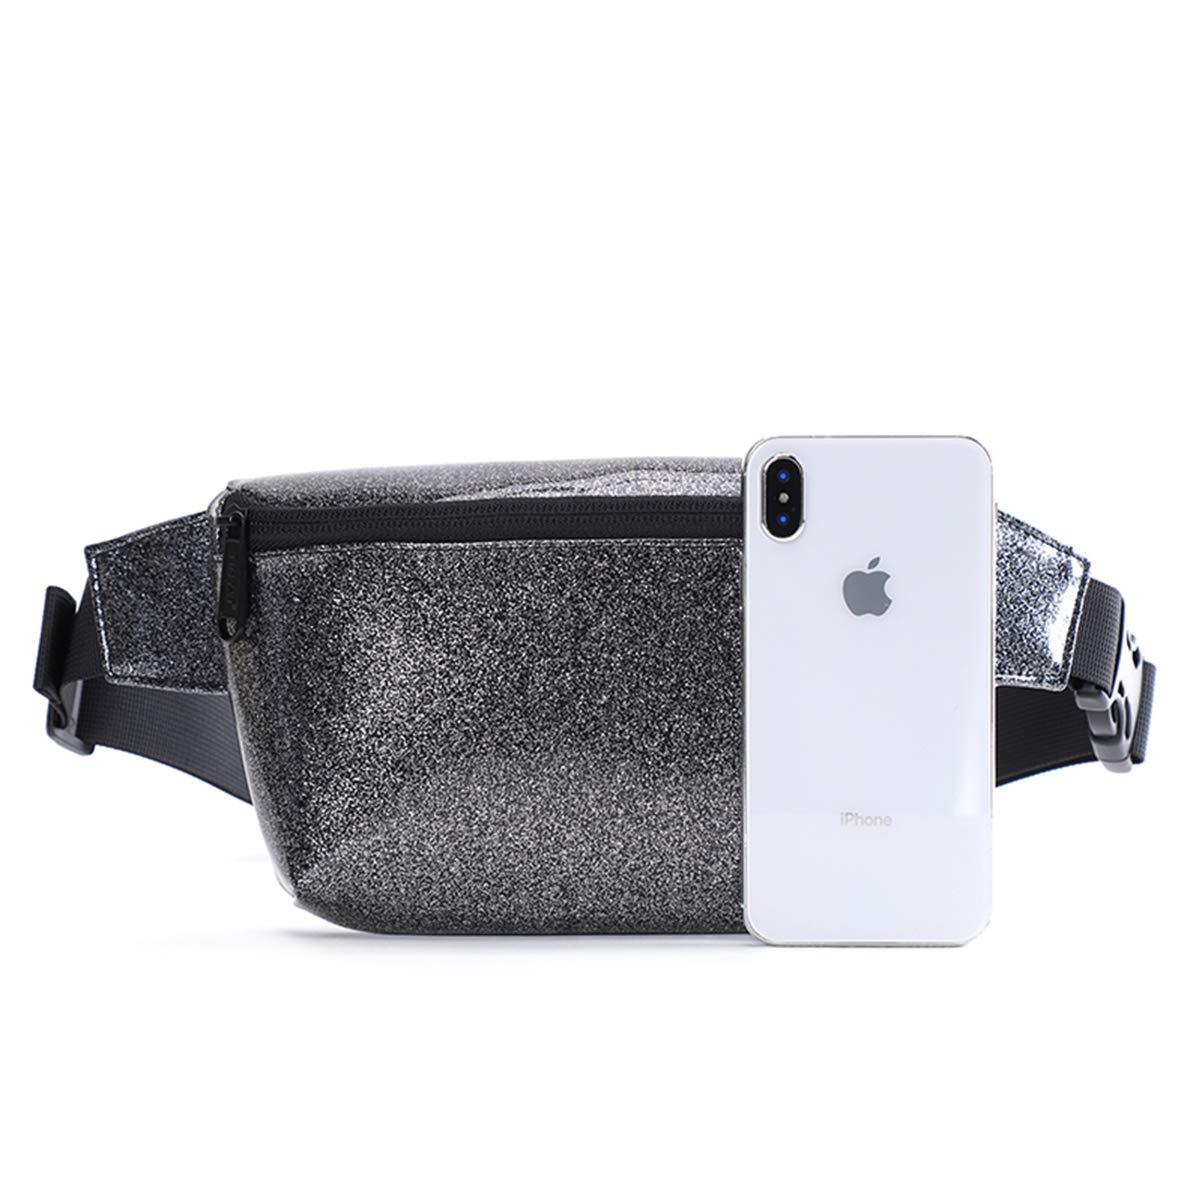 Tinyat transparent PVC reiseg/ürtel kleine Tasche Mode g/ürtel kleine Tasche Gurt Tasche ultraleichte Reisetasche T1952